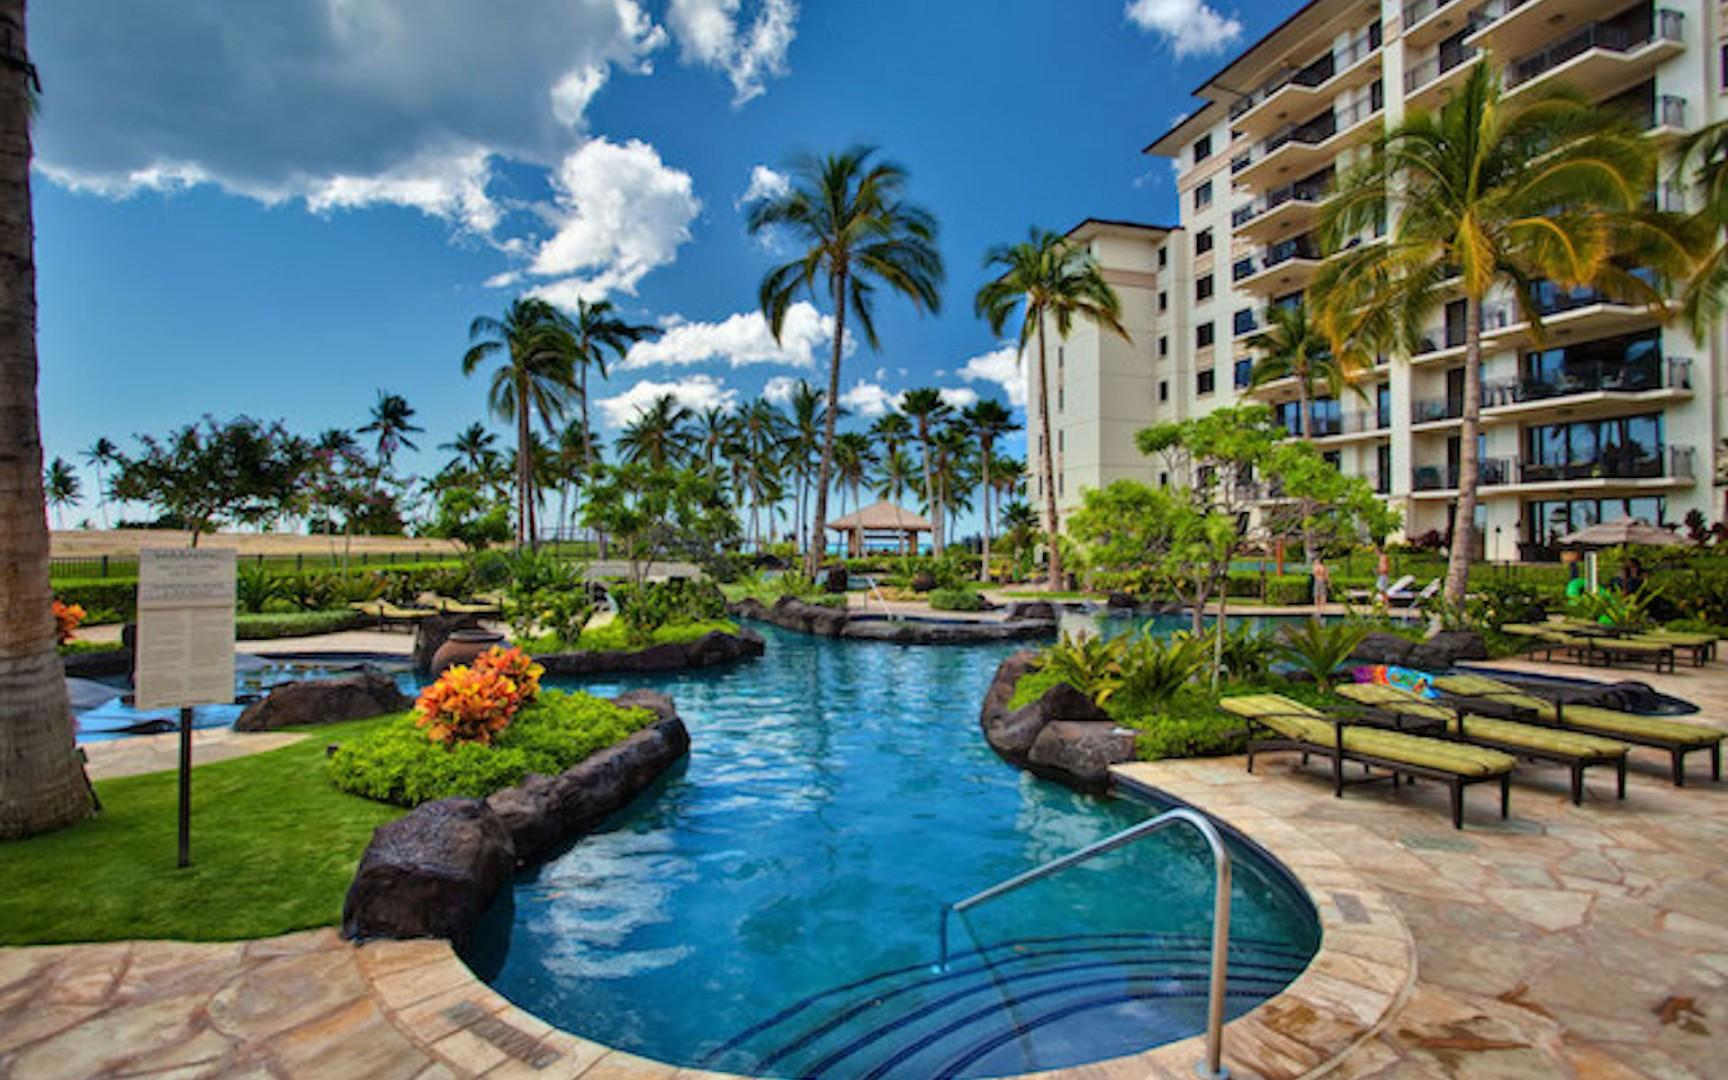 Lagoon Pool located between your villa and Lagoon 2